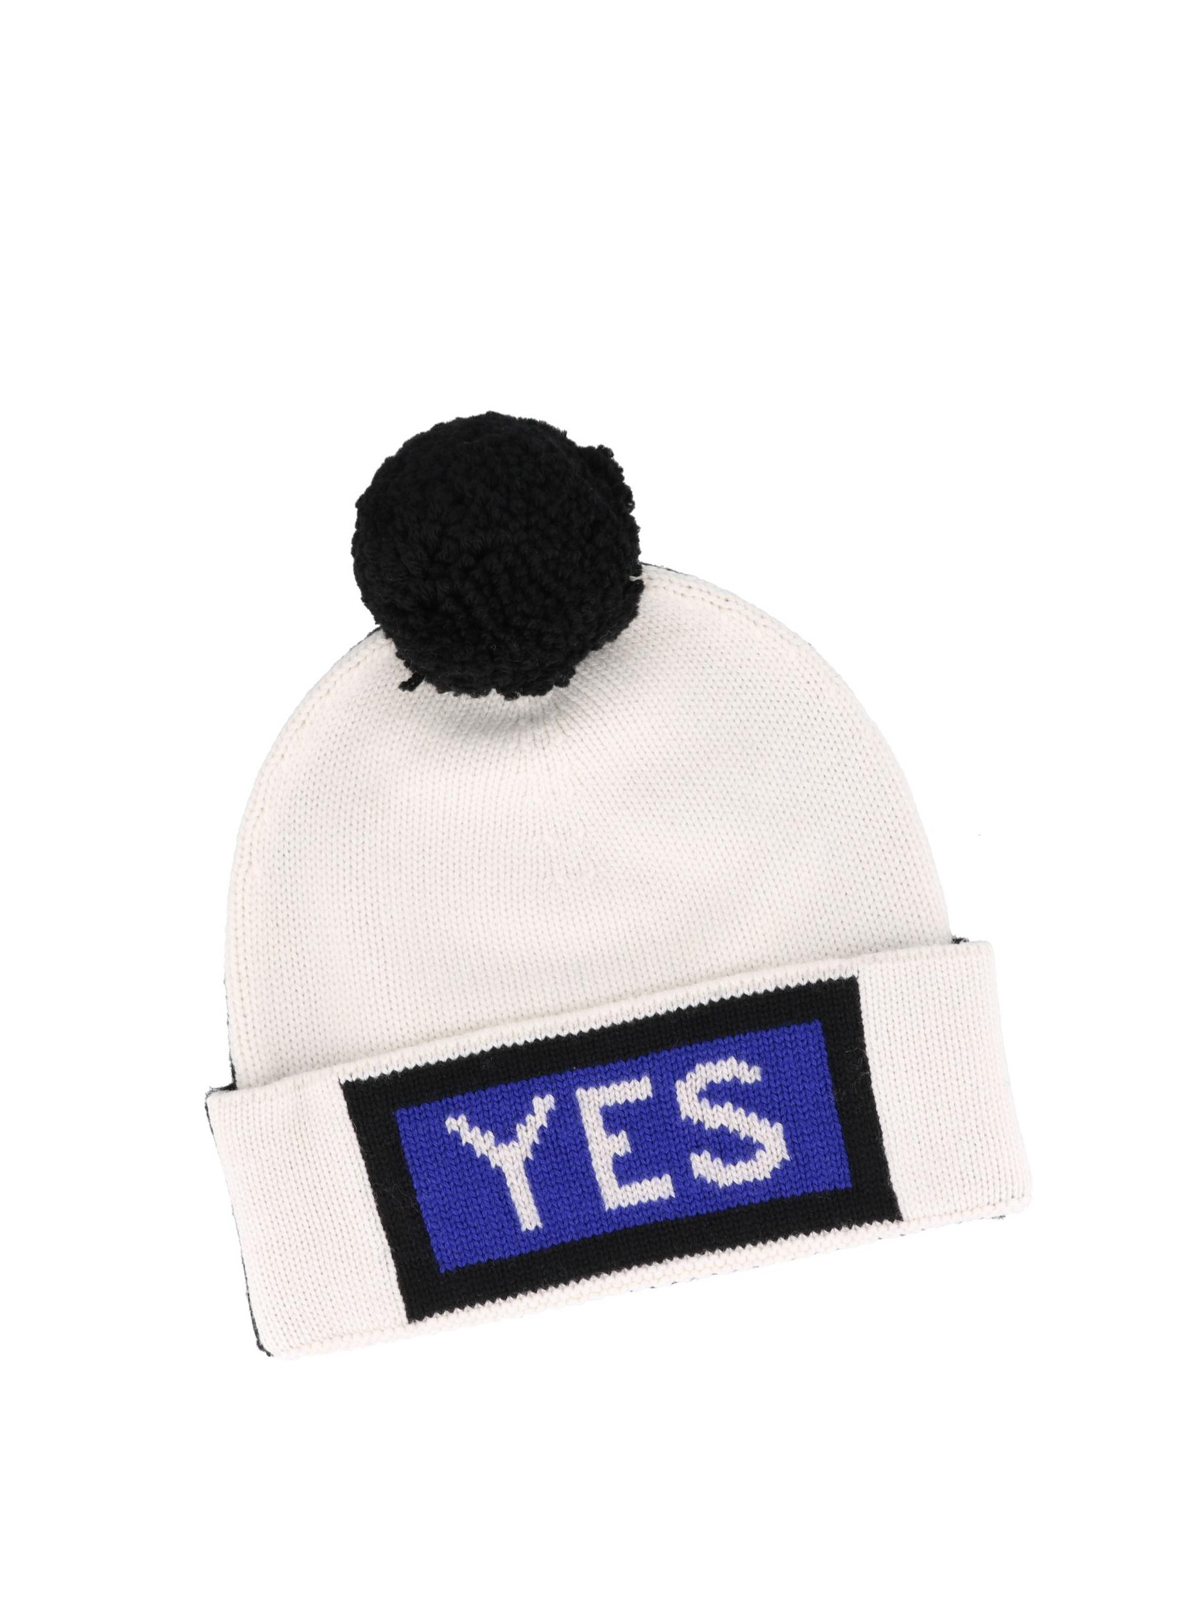 FENDI  hats   caps online - Wool beanie with knitted Fendi logo f68d54538b5d